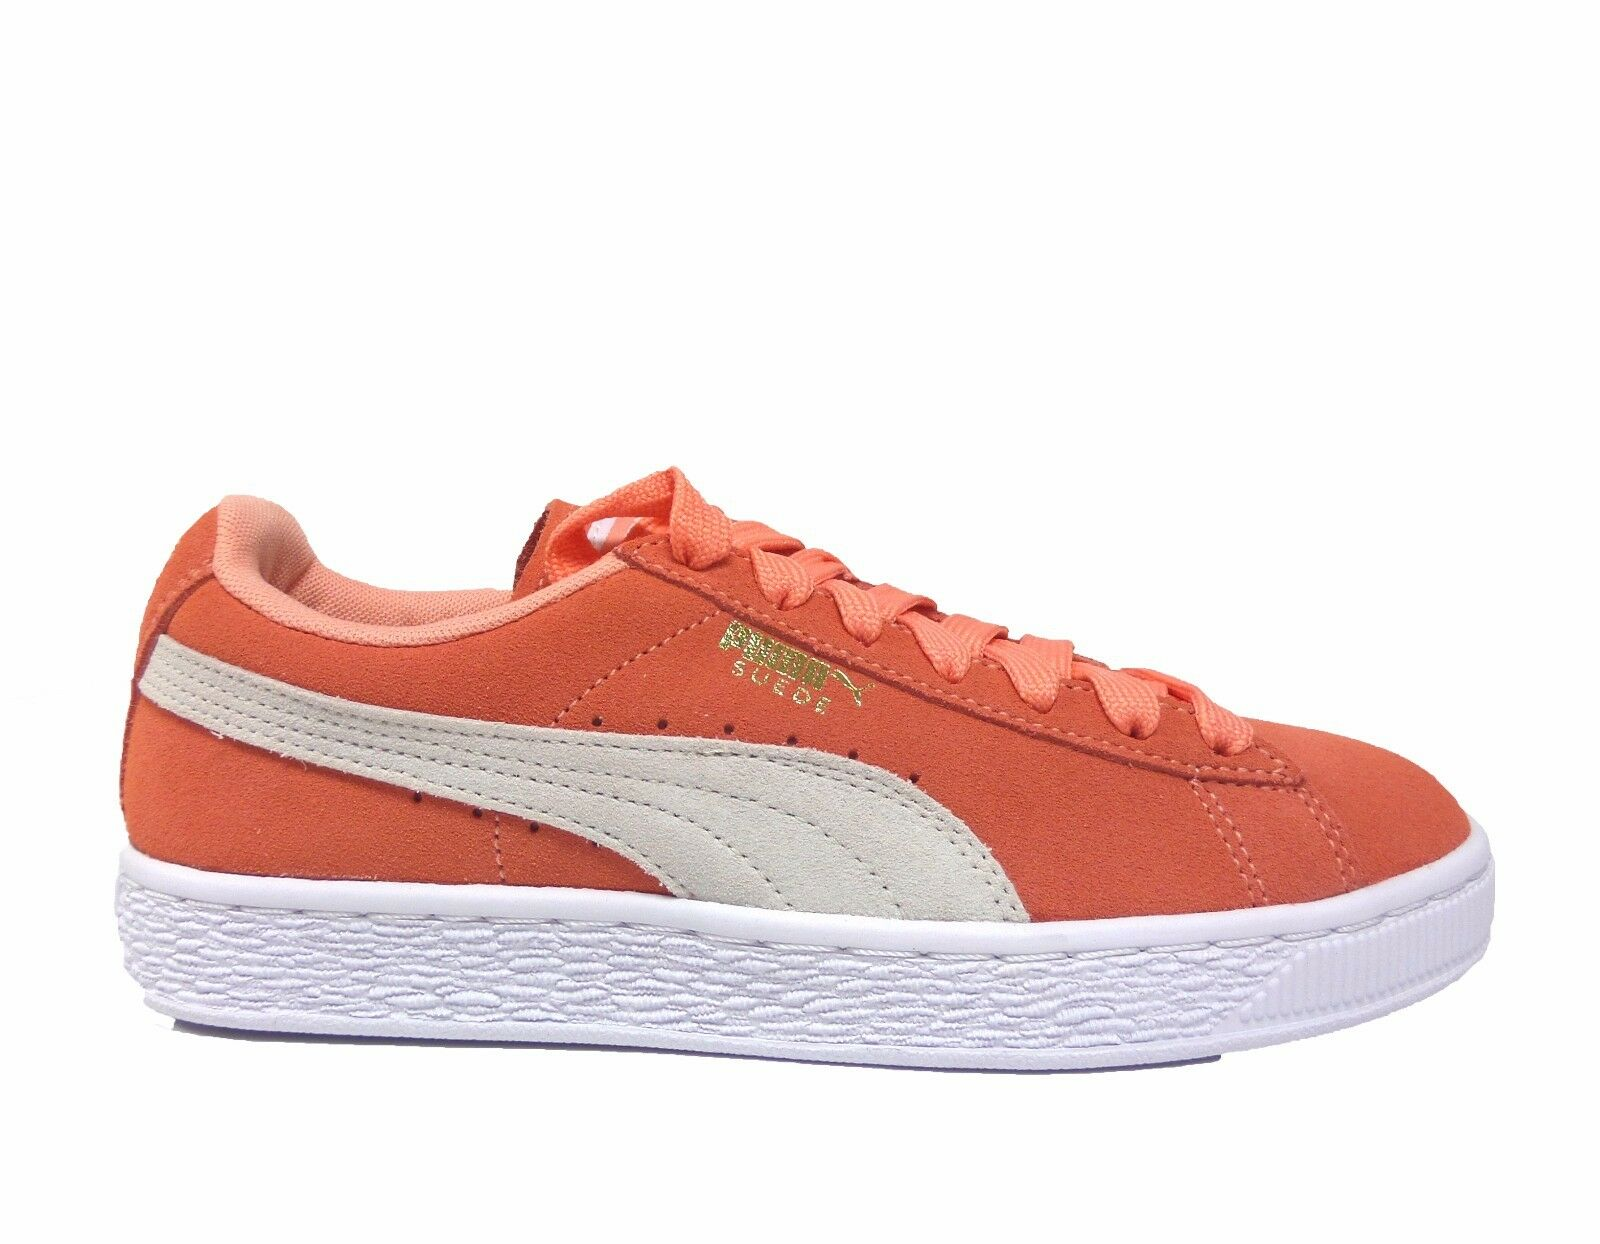 Puma Donna  SUEDE CLASSIC scarpe scarpe scarpe Desert Flower bianca 355462-33 a edec56